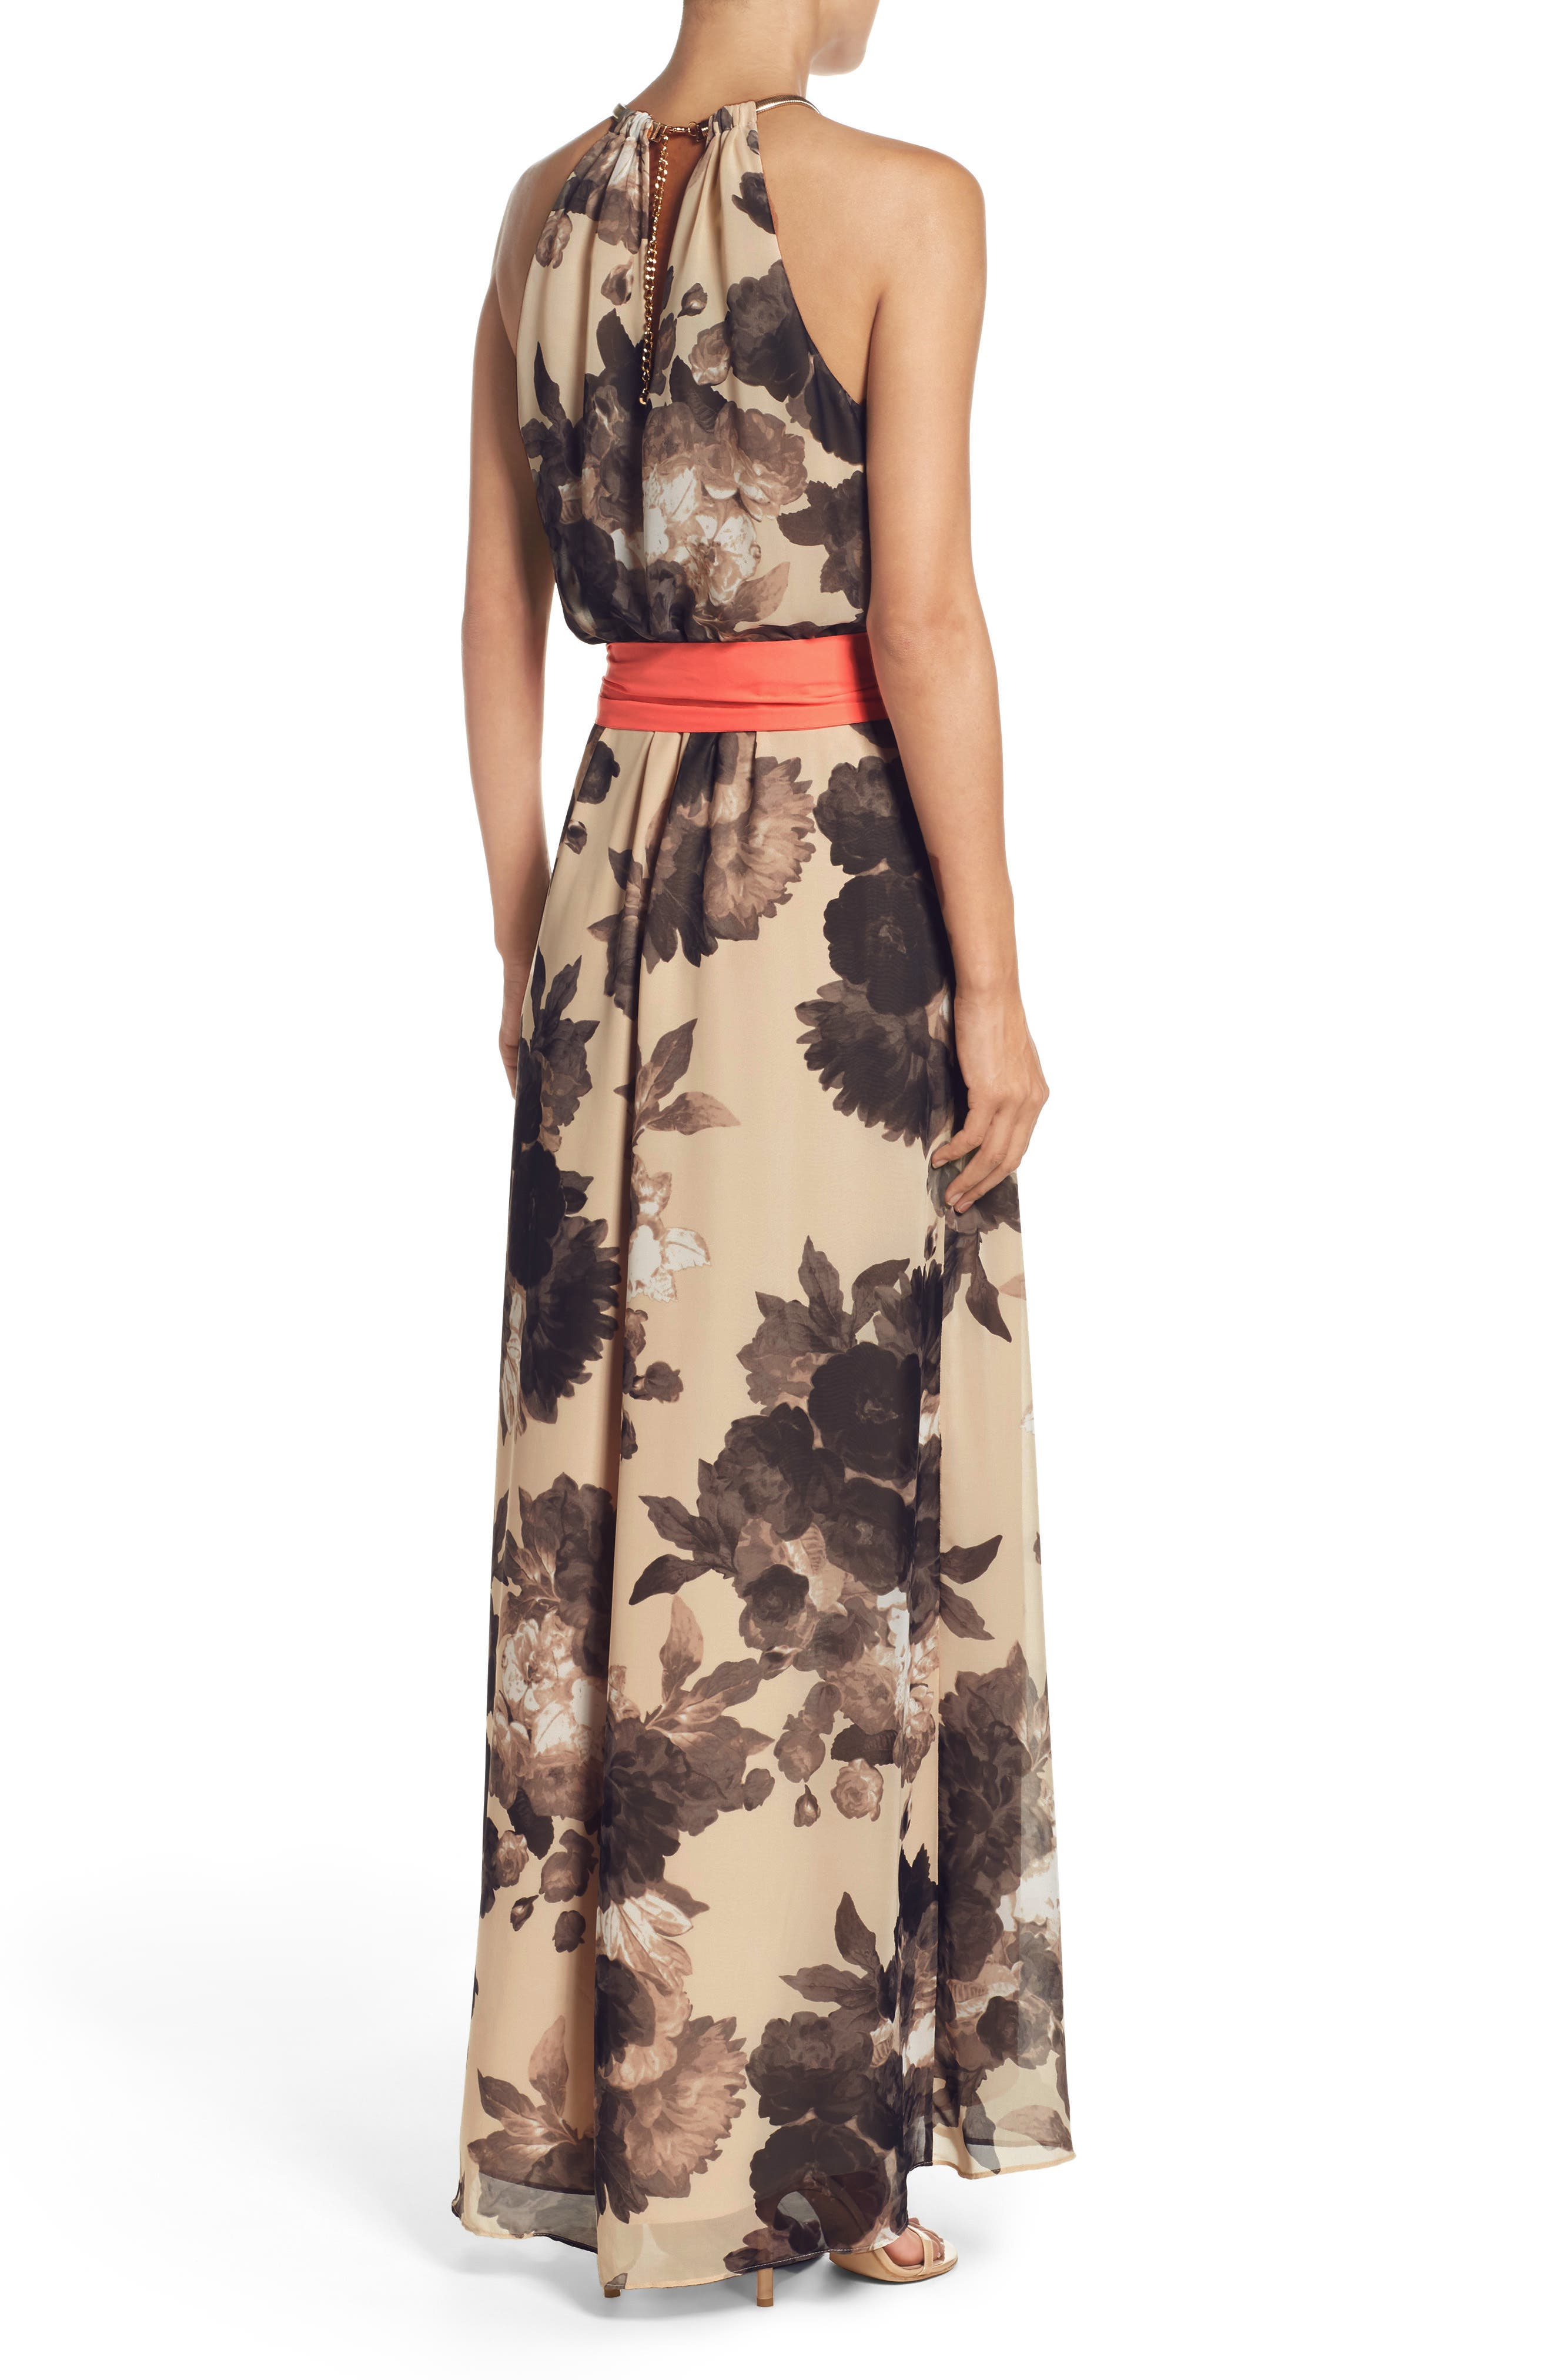 ELIZA J, Floral Print Halter Chiffon Maxi Dress, Alternate thumbnail 2, color, 250